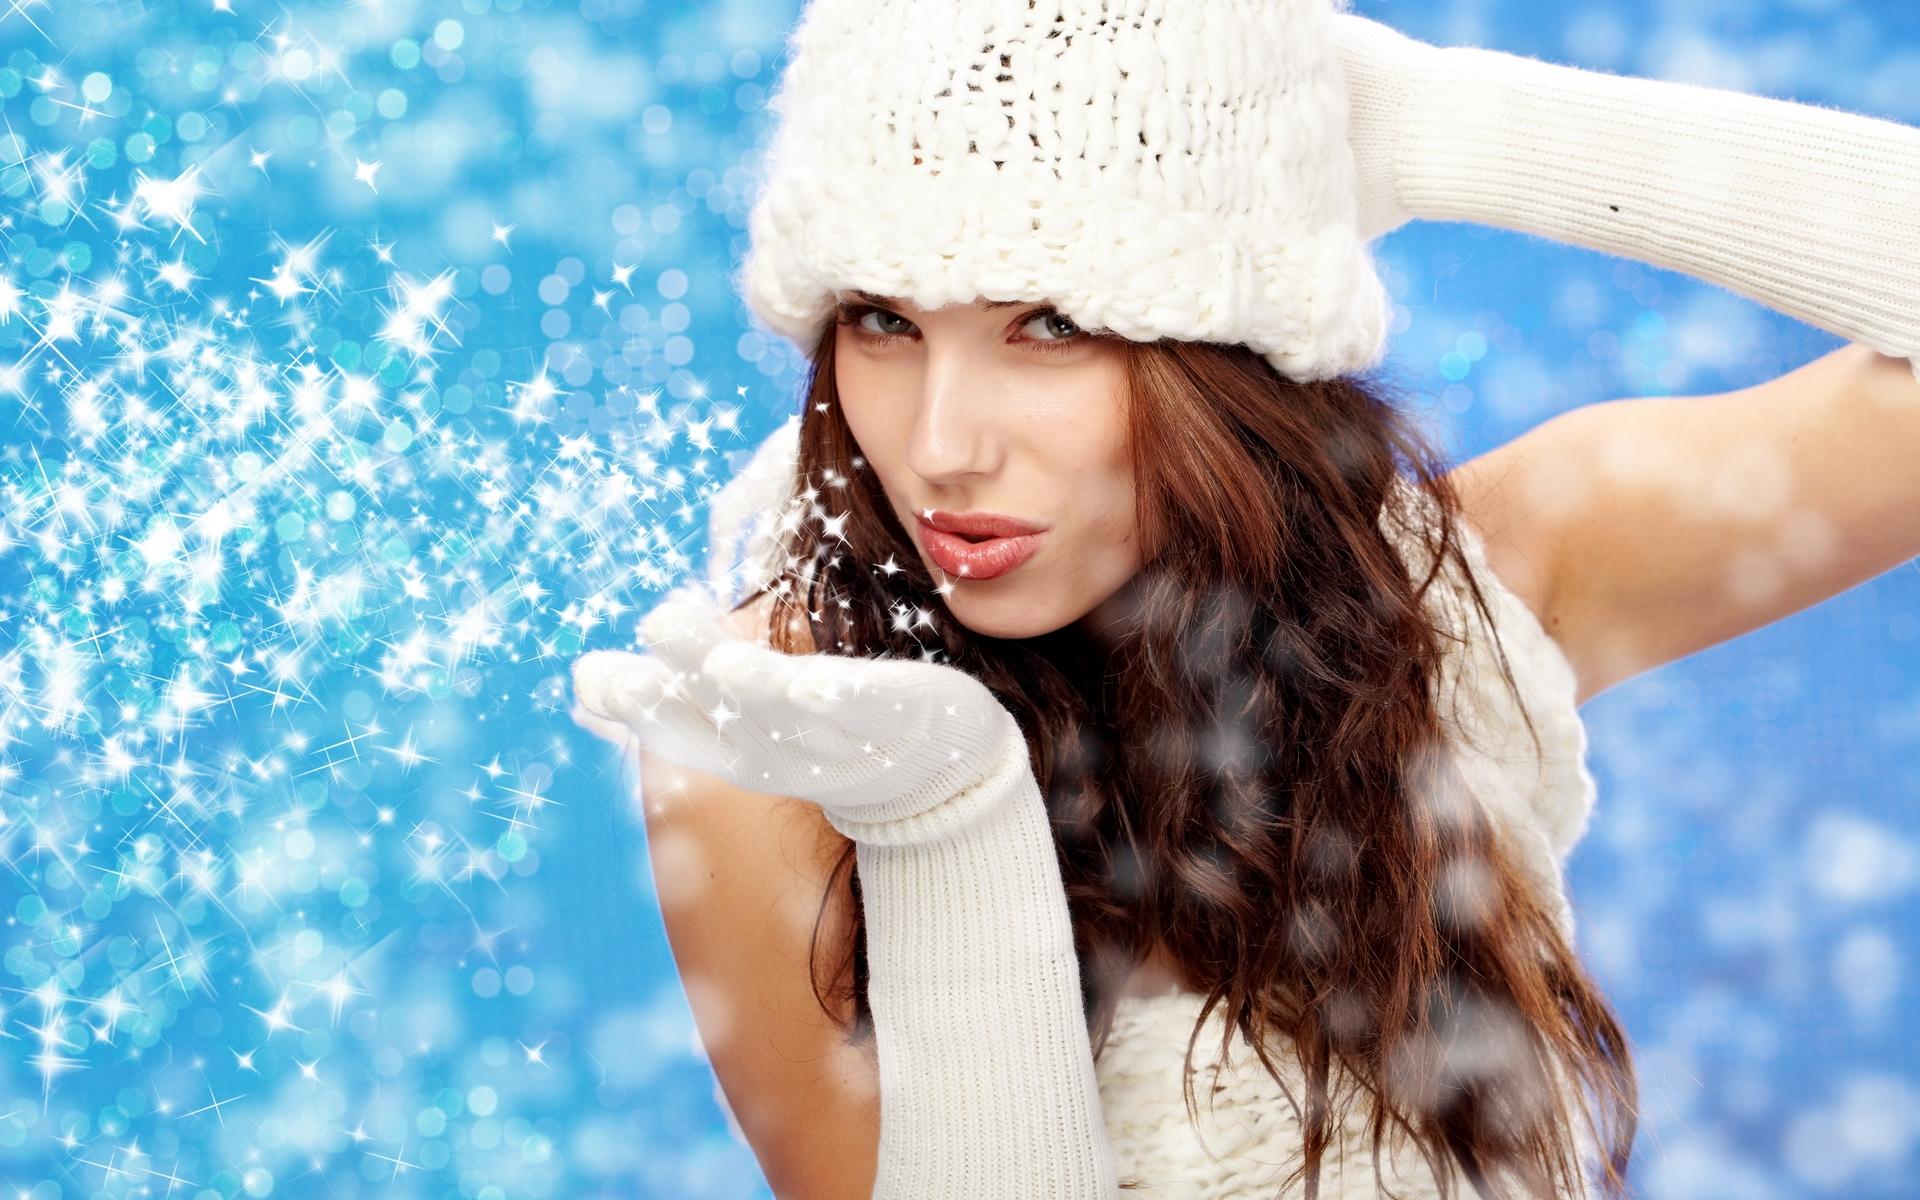 Девушка в снежинках картинки